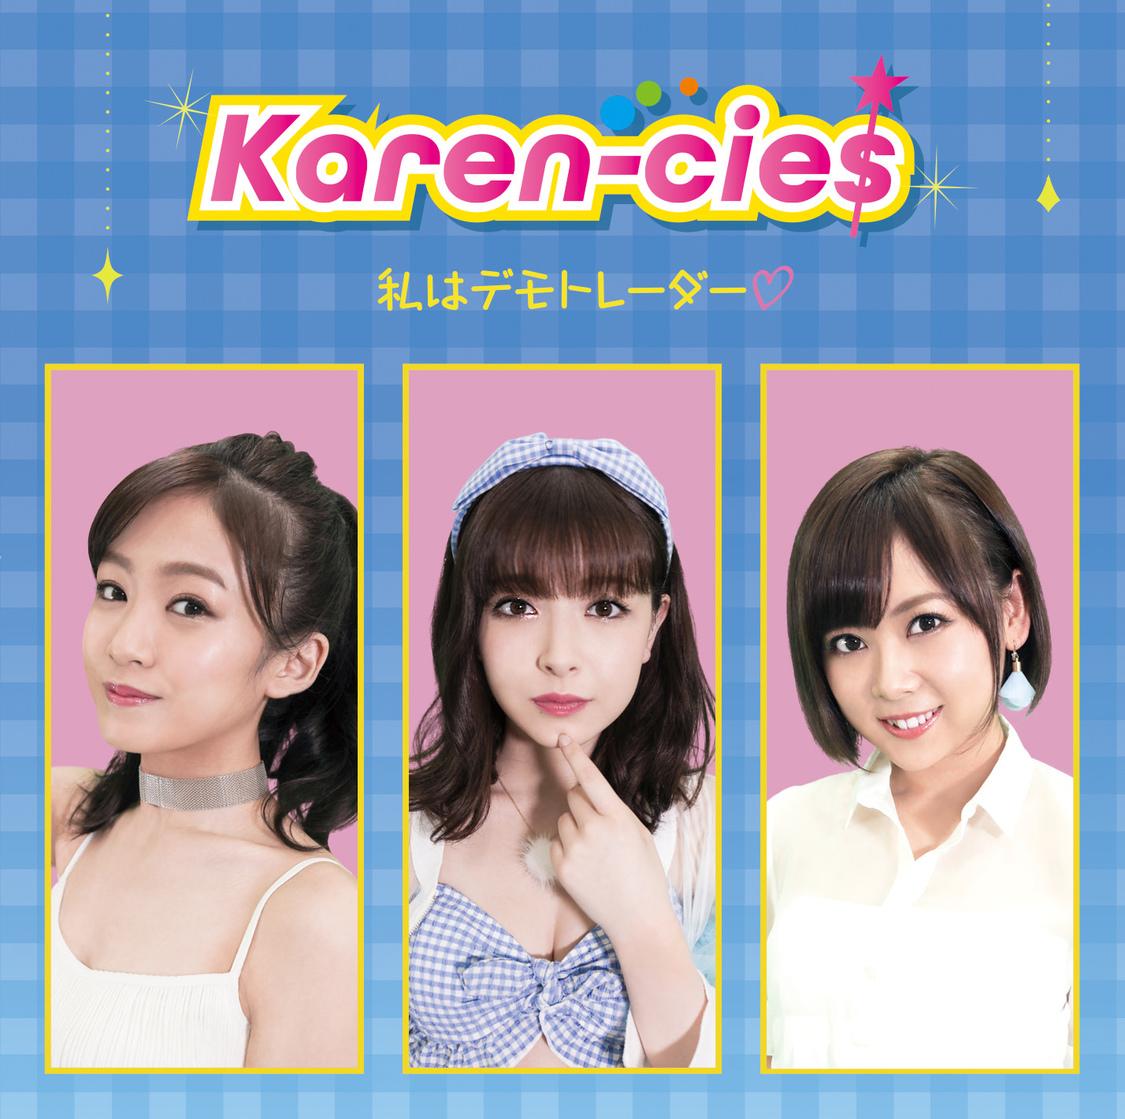 Karen-cies、FX業界初のアイドルとしてデビュー!